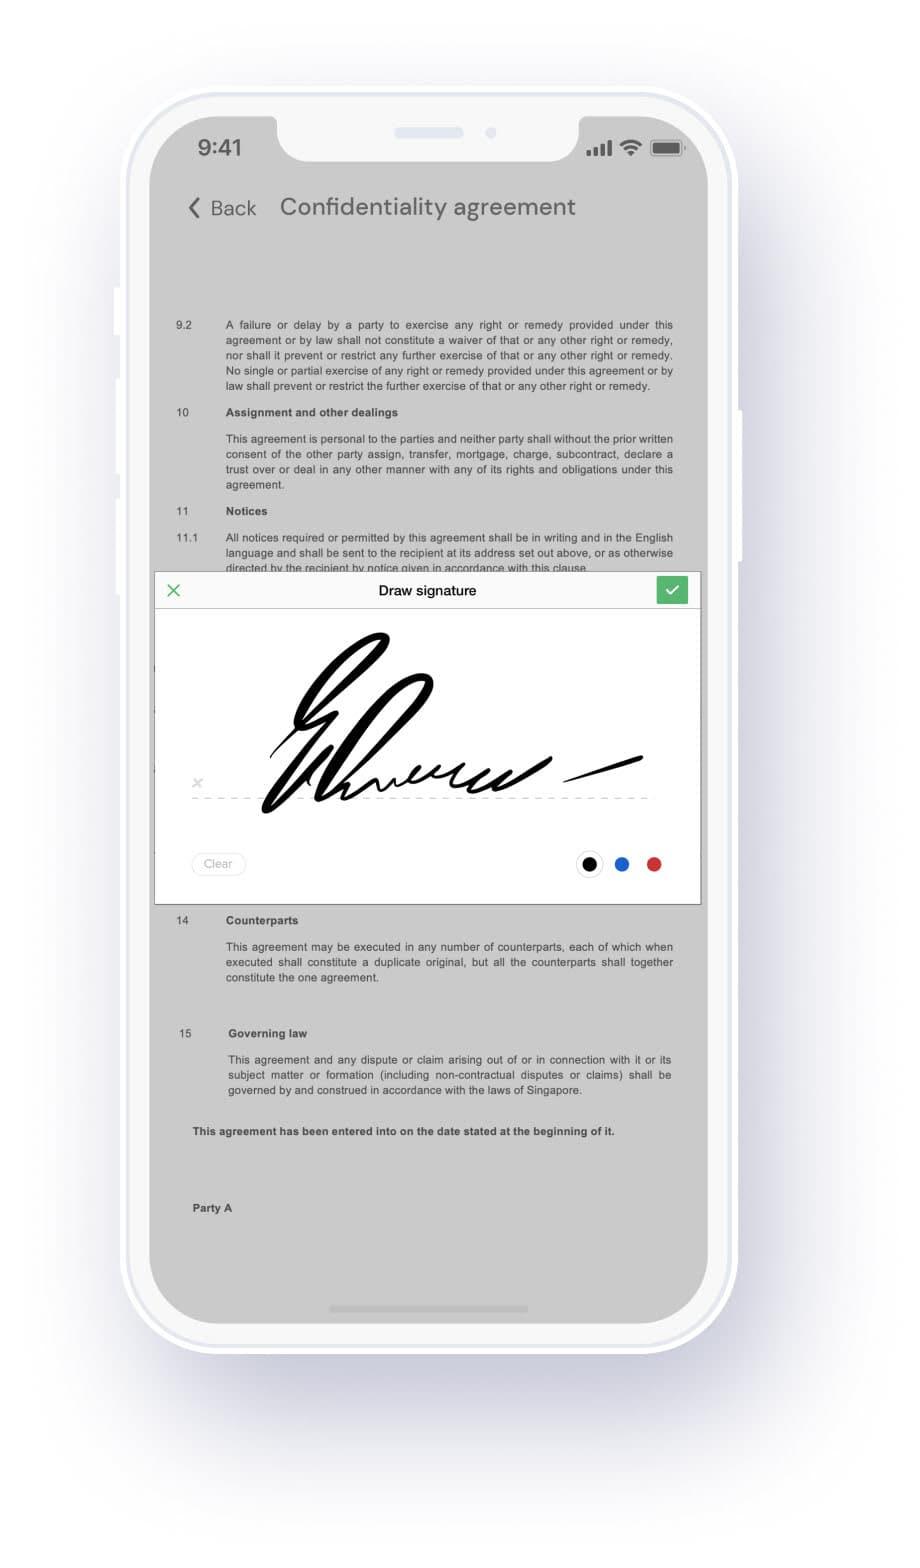 Qualee Employee Onboarding App - Unlimited eSignature